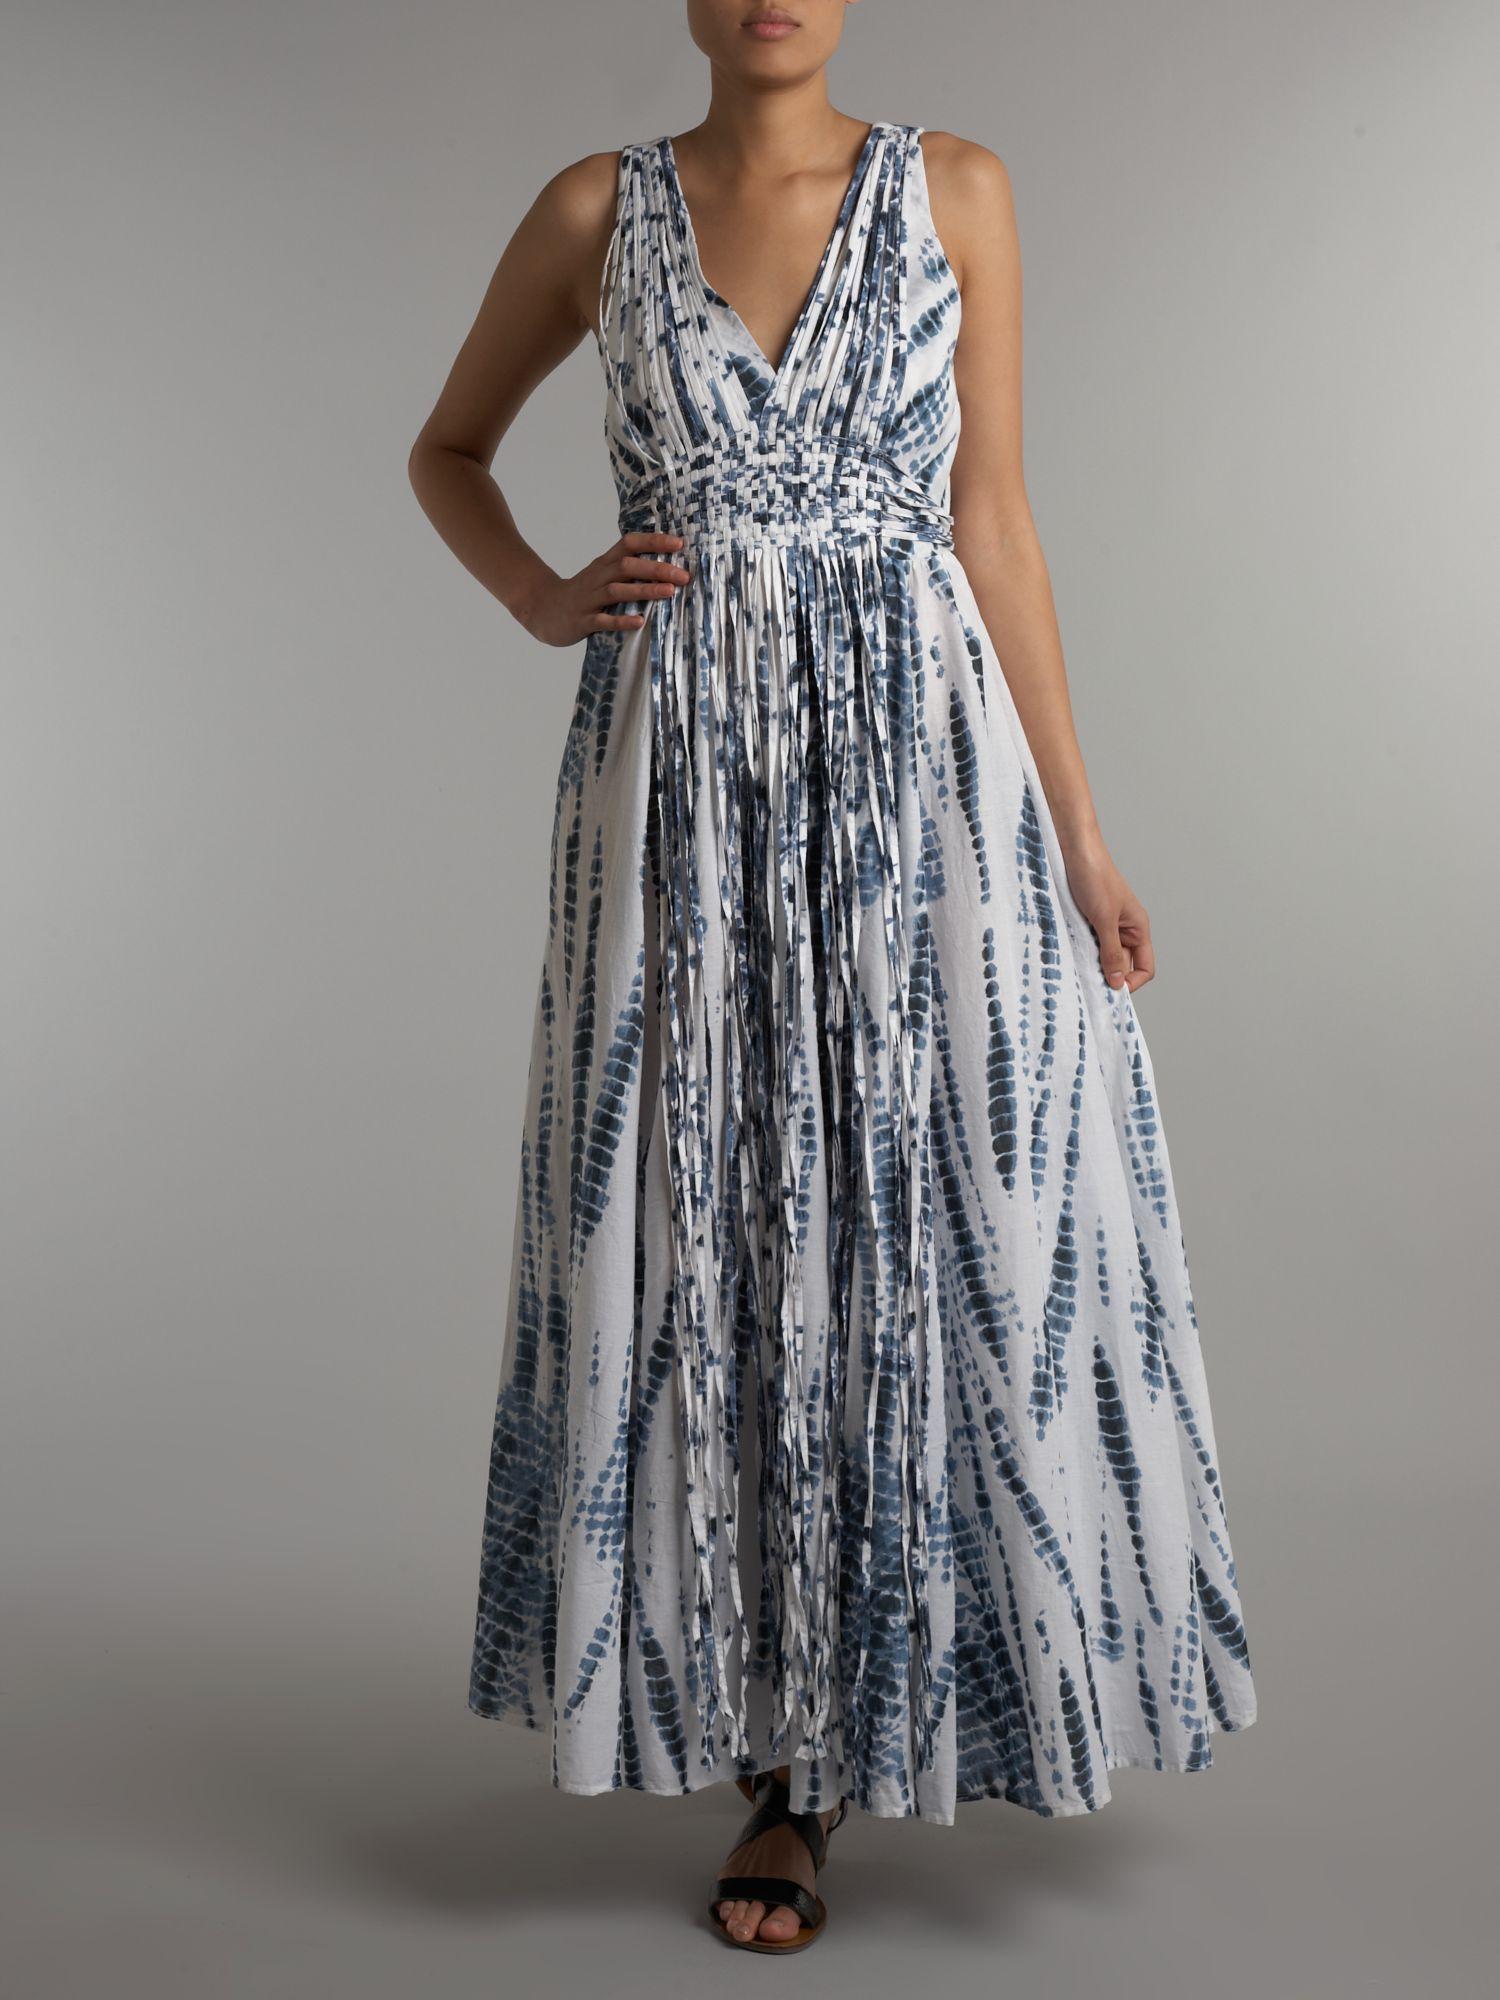 Michael Kors Tie Dye Maxi Dress Online Uk